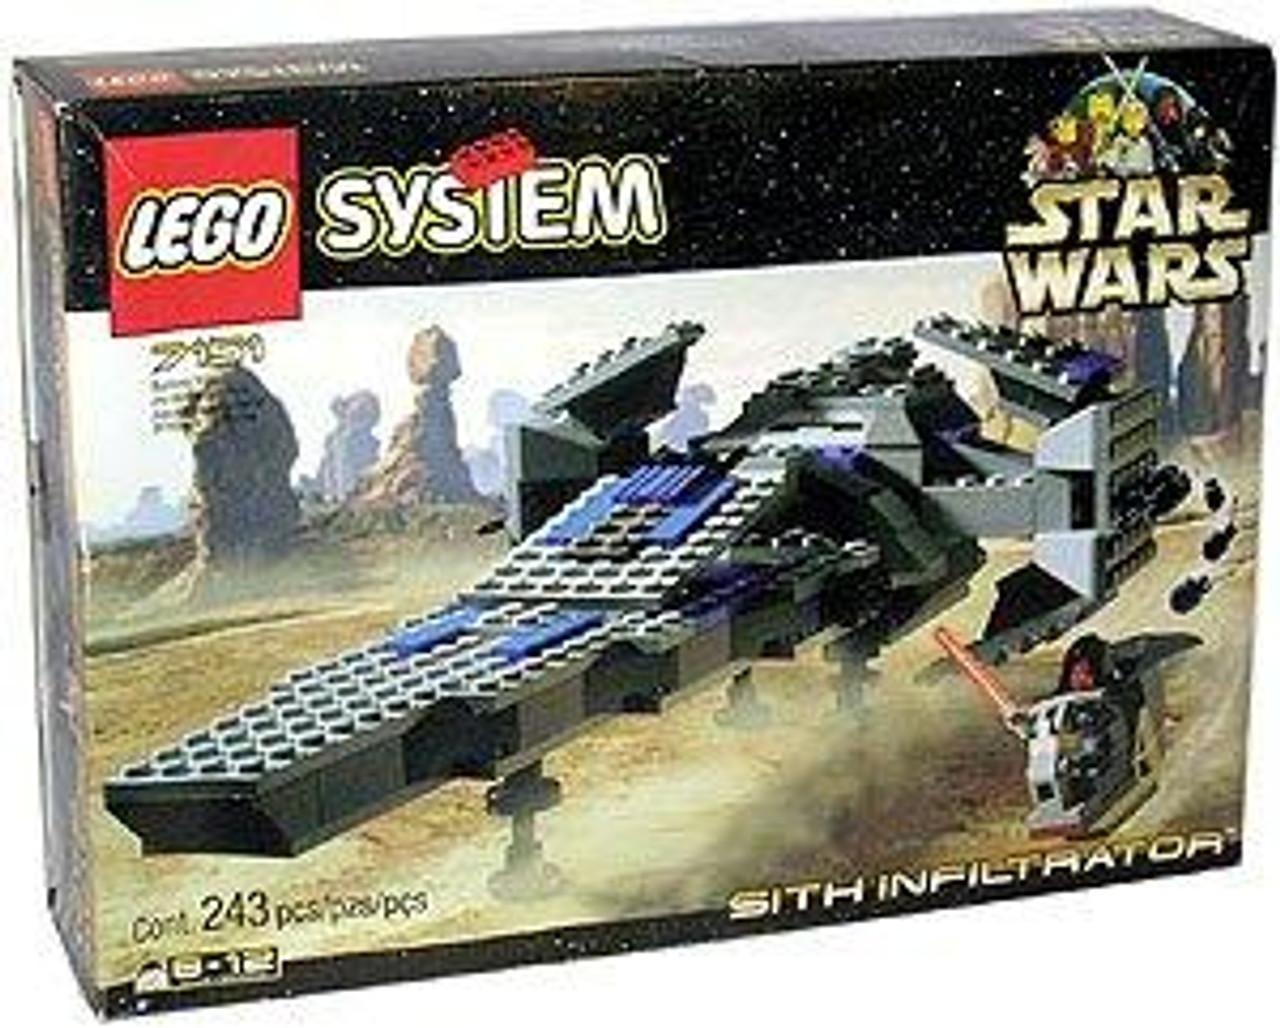 LEGO Star Wars The Phantom Menace Sith Infiltrator Set #7151